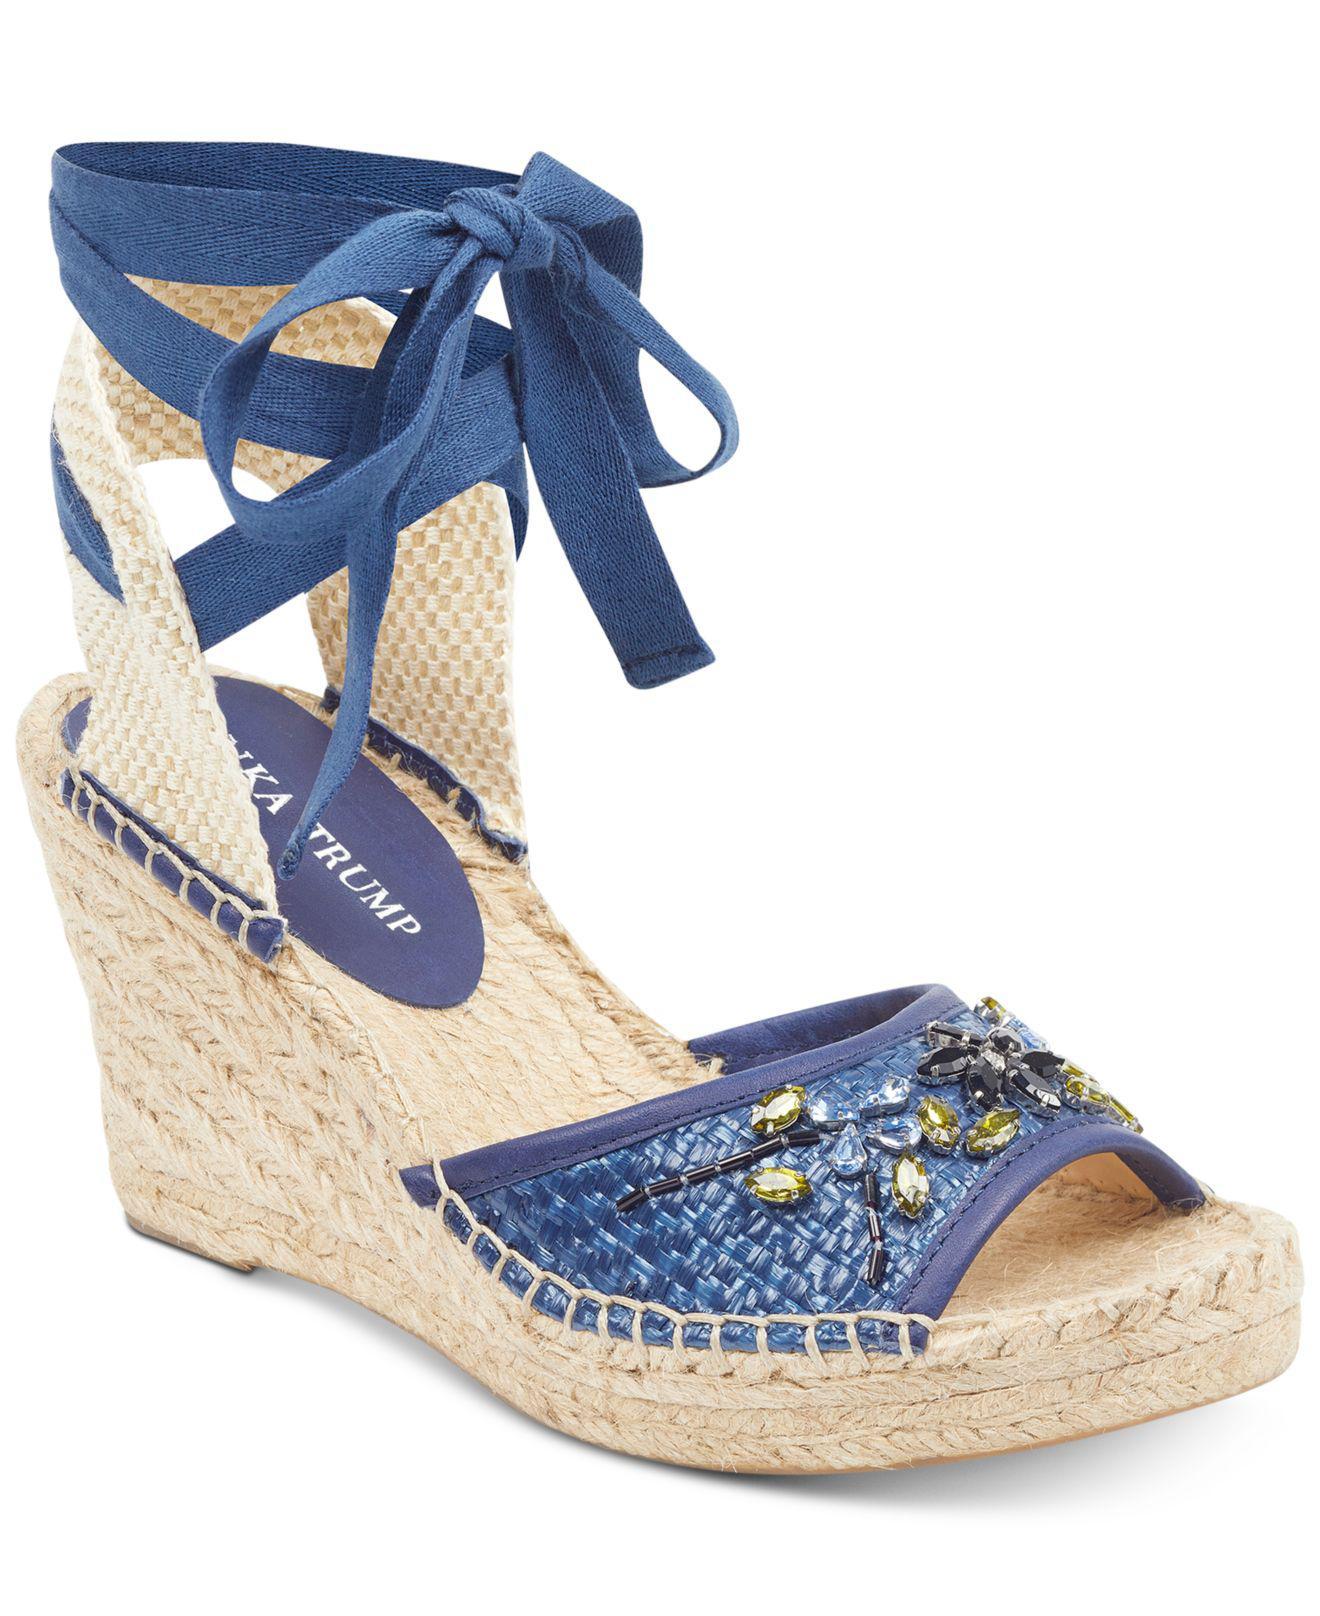 Ivanka Trump. Women's Blue Daylana Espadrille Wedge Sandals